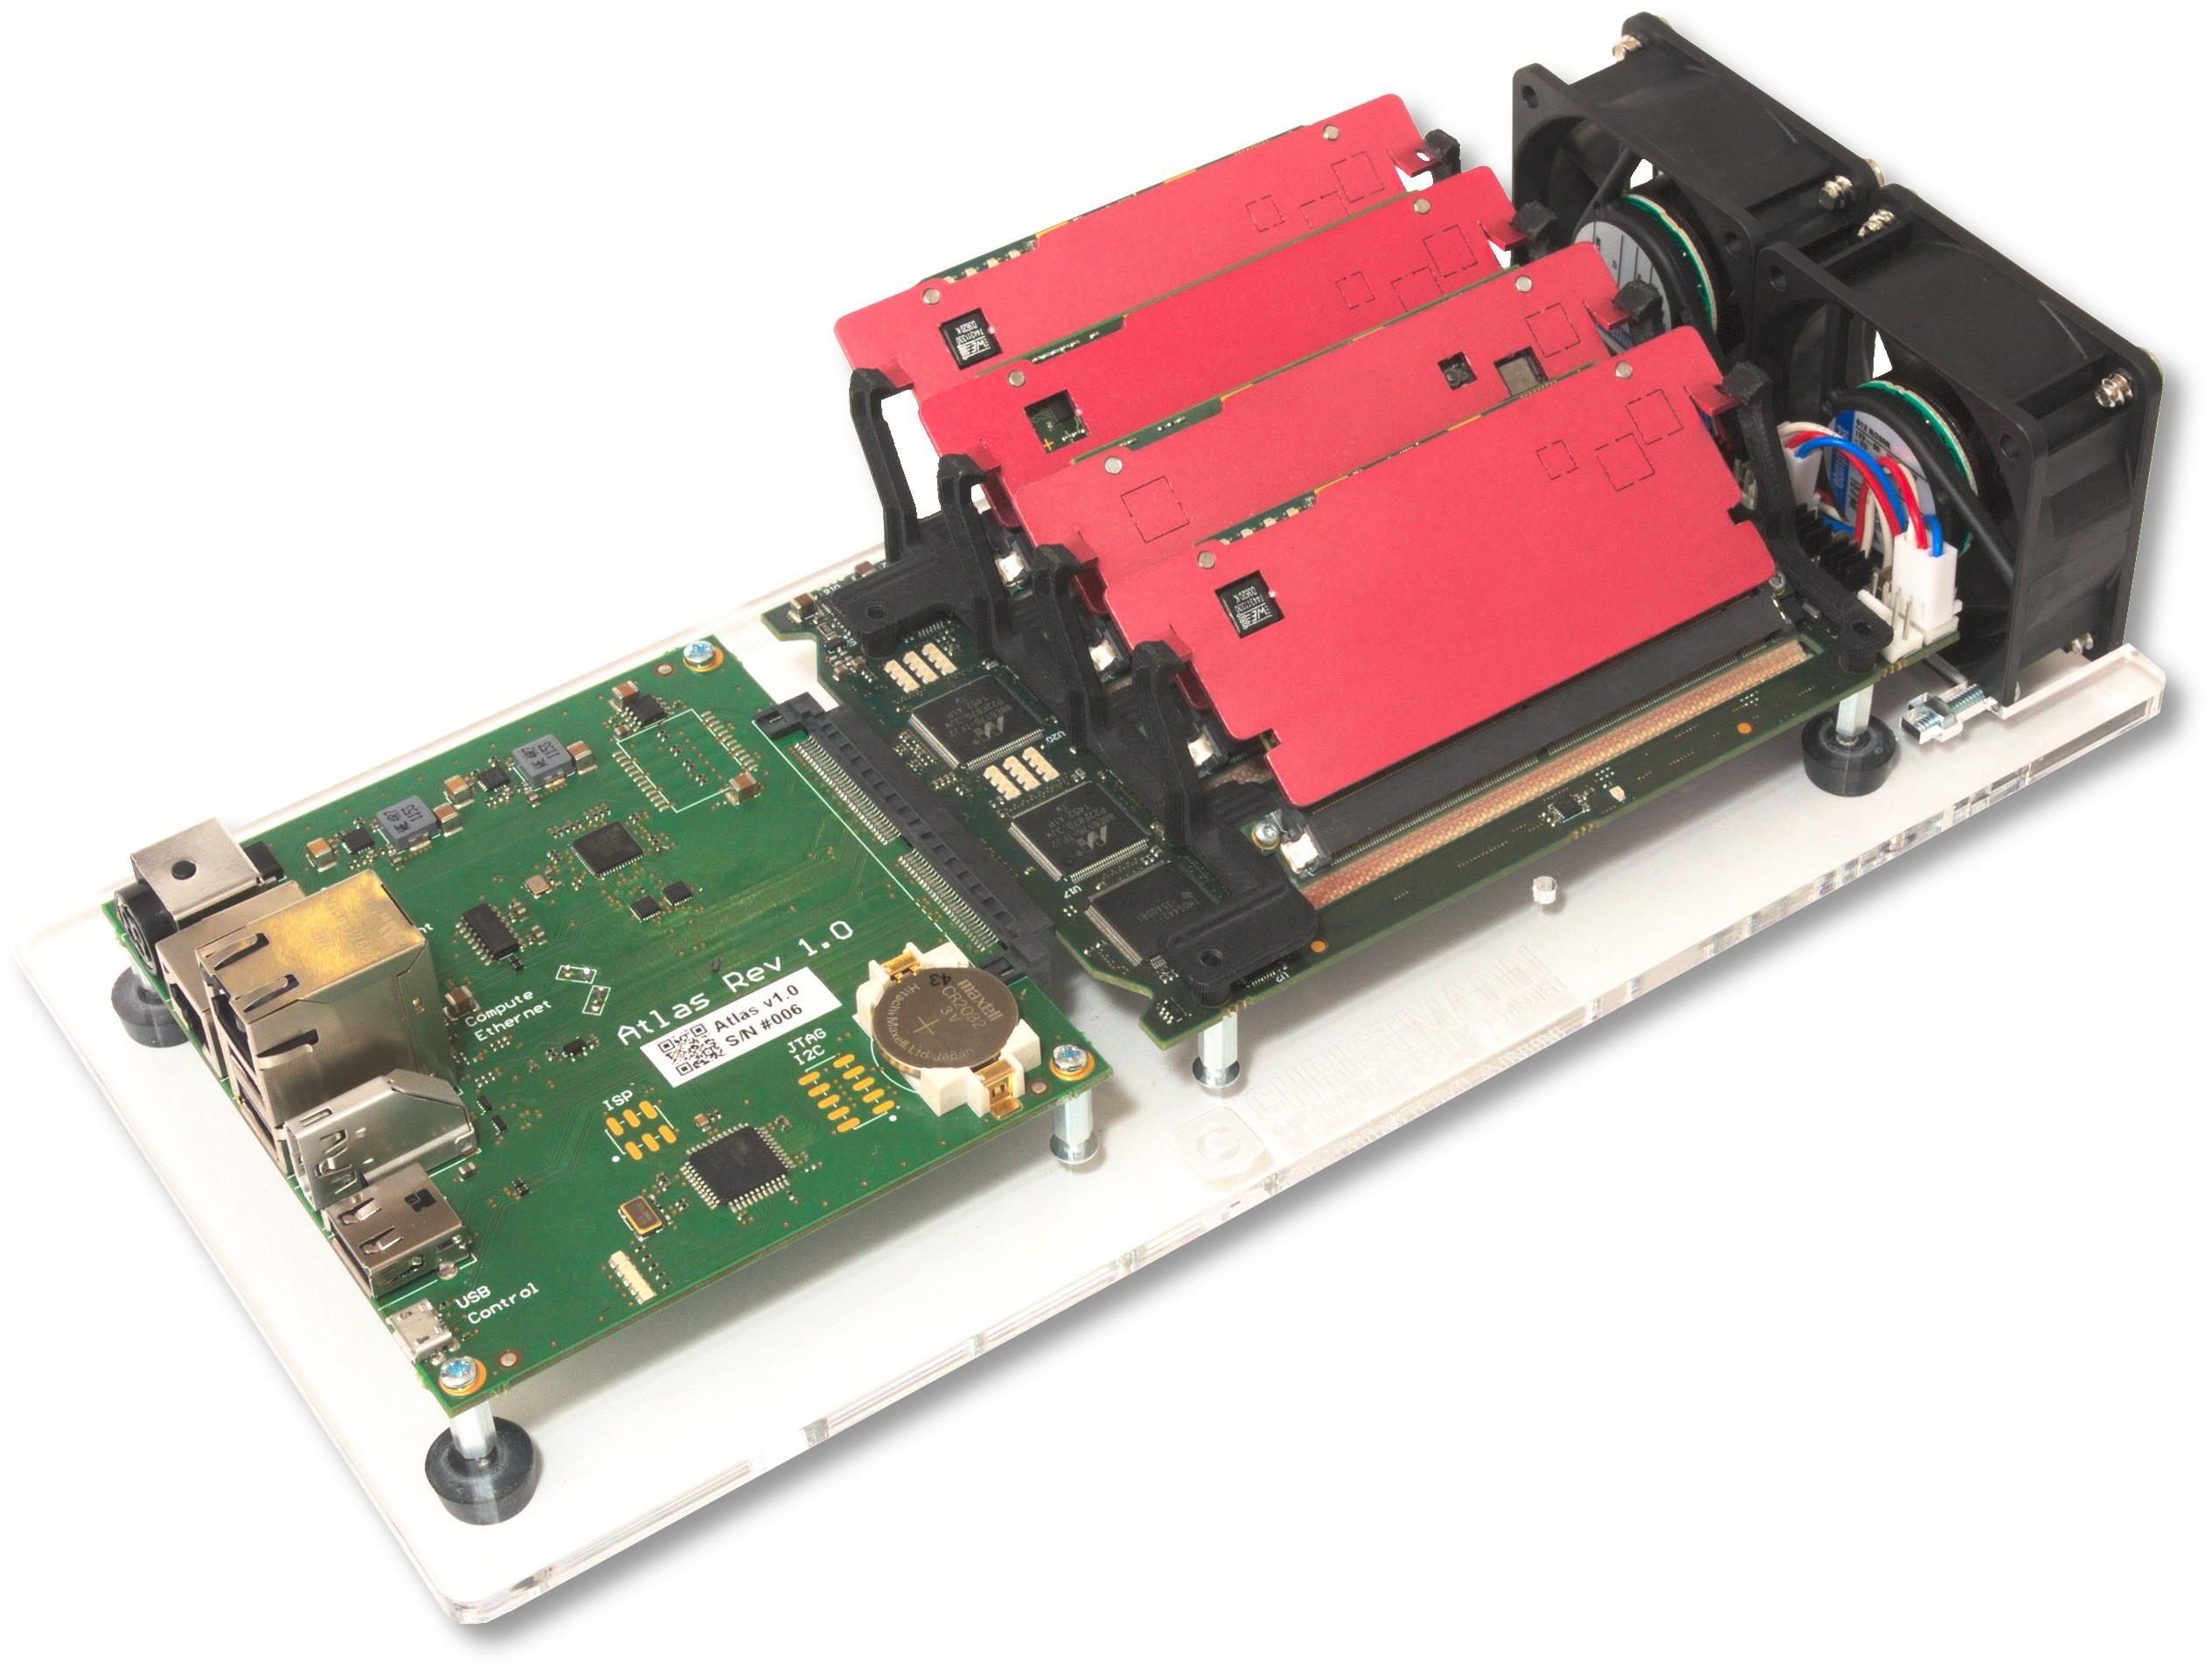 Christmann RECS|Box Atlas Quad Apalis Microserver Evaluation Kit